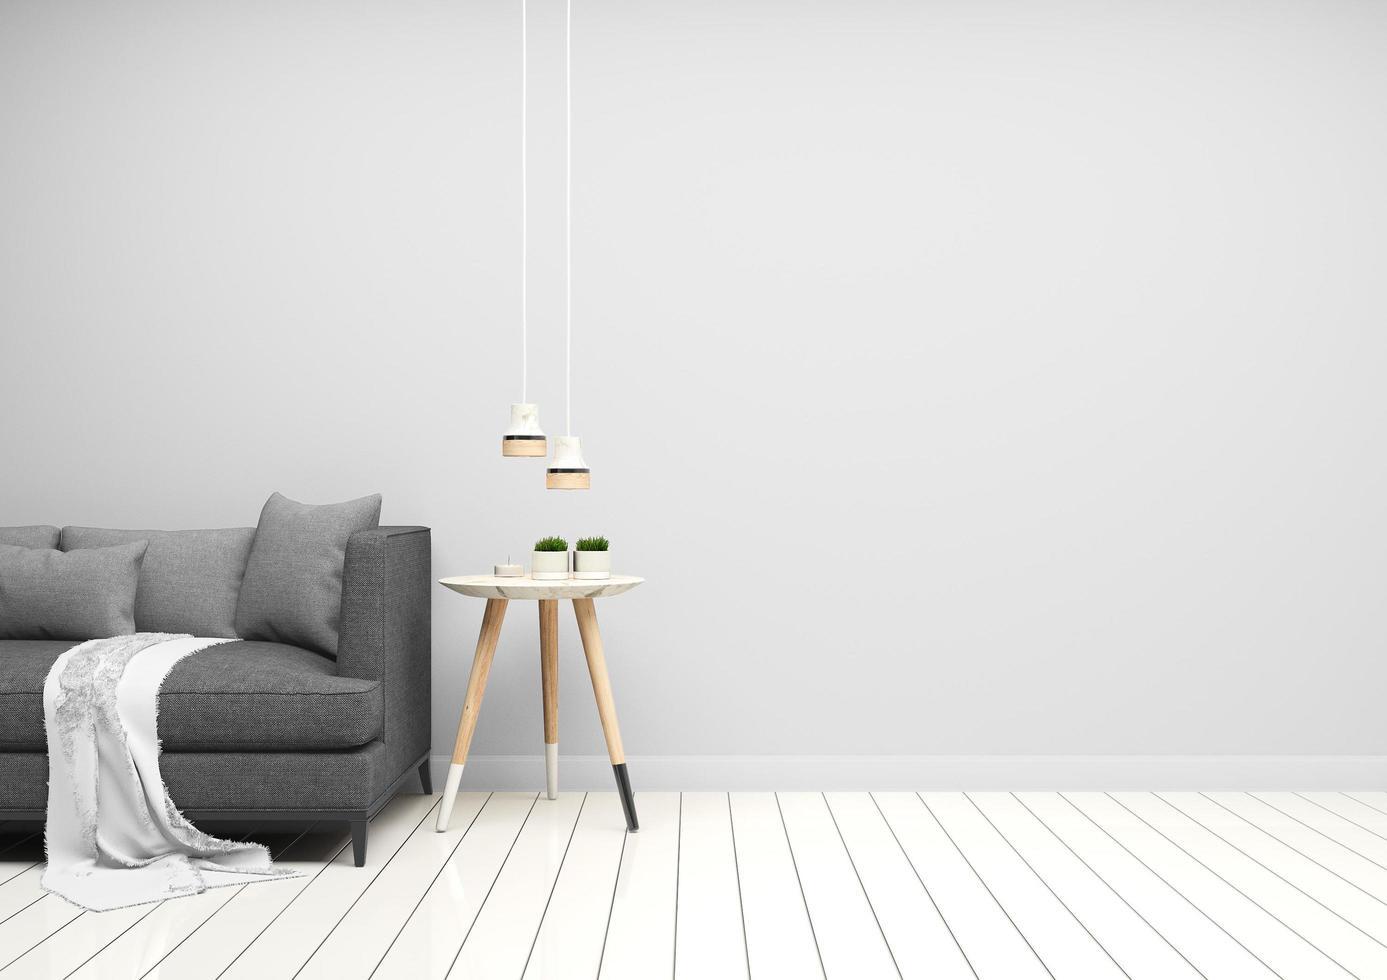 sala de estar moderna gris foto